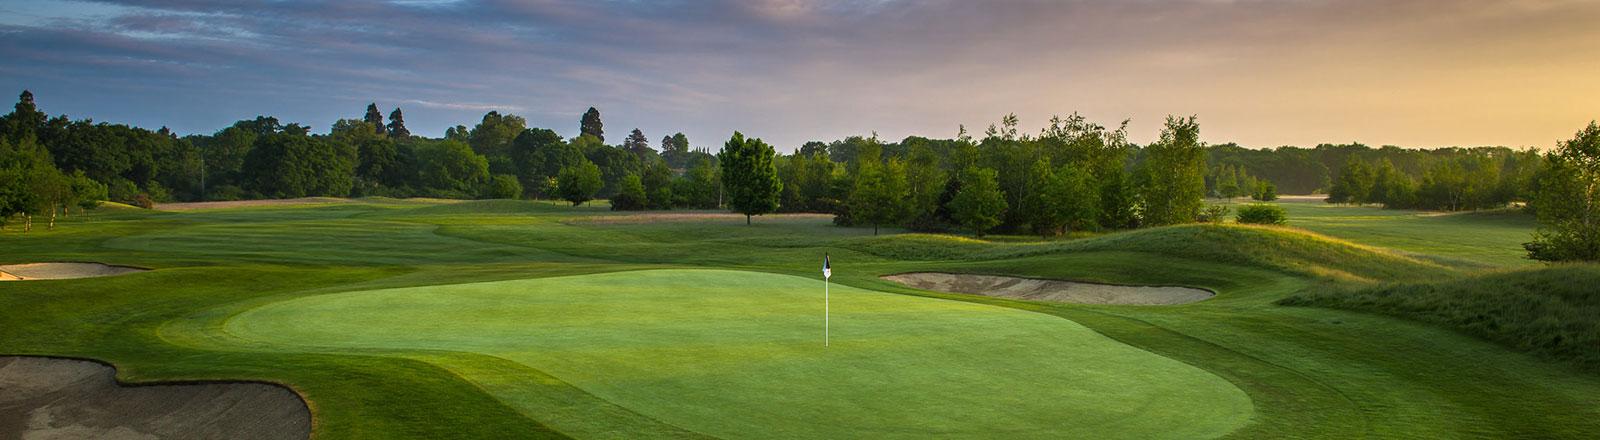 Burhill Golf Club evening shot